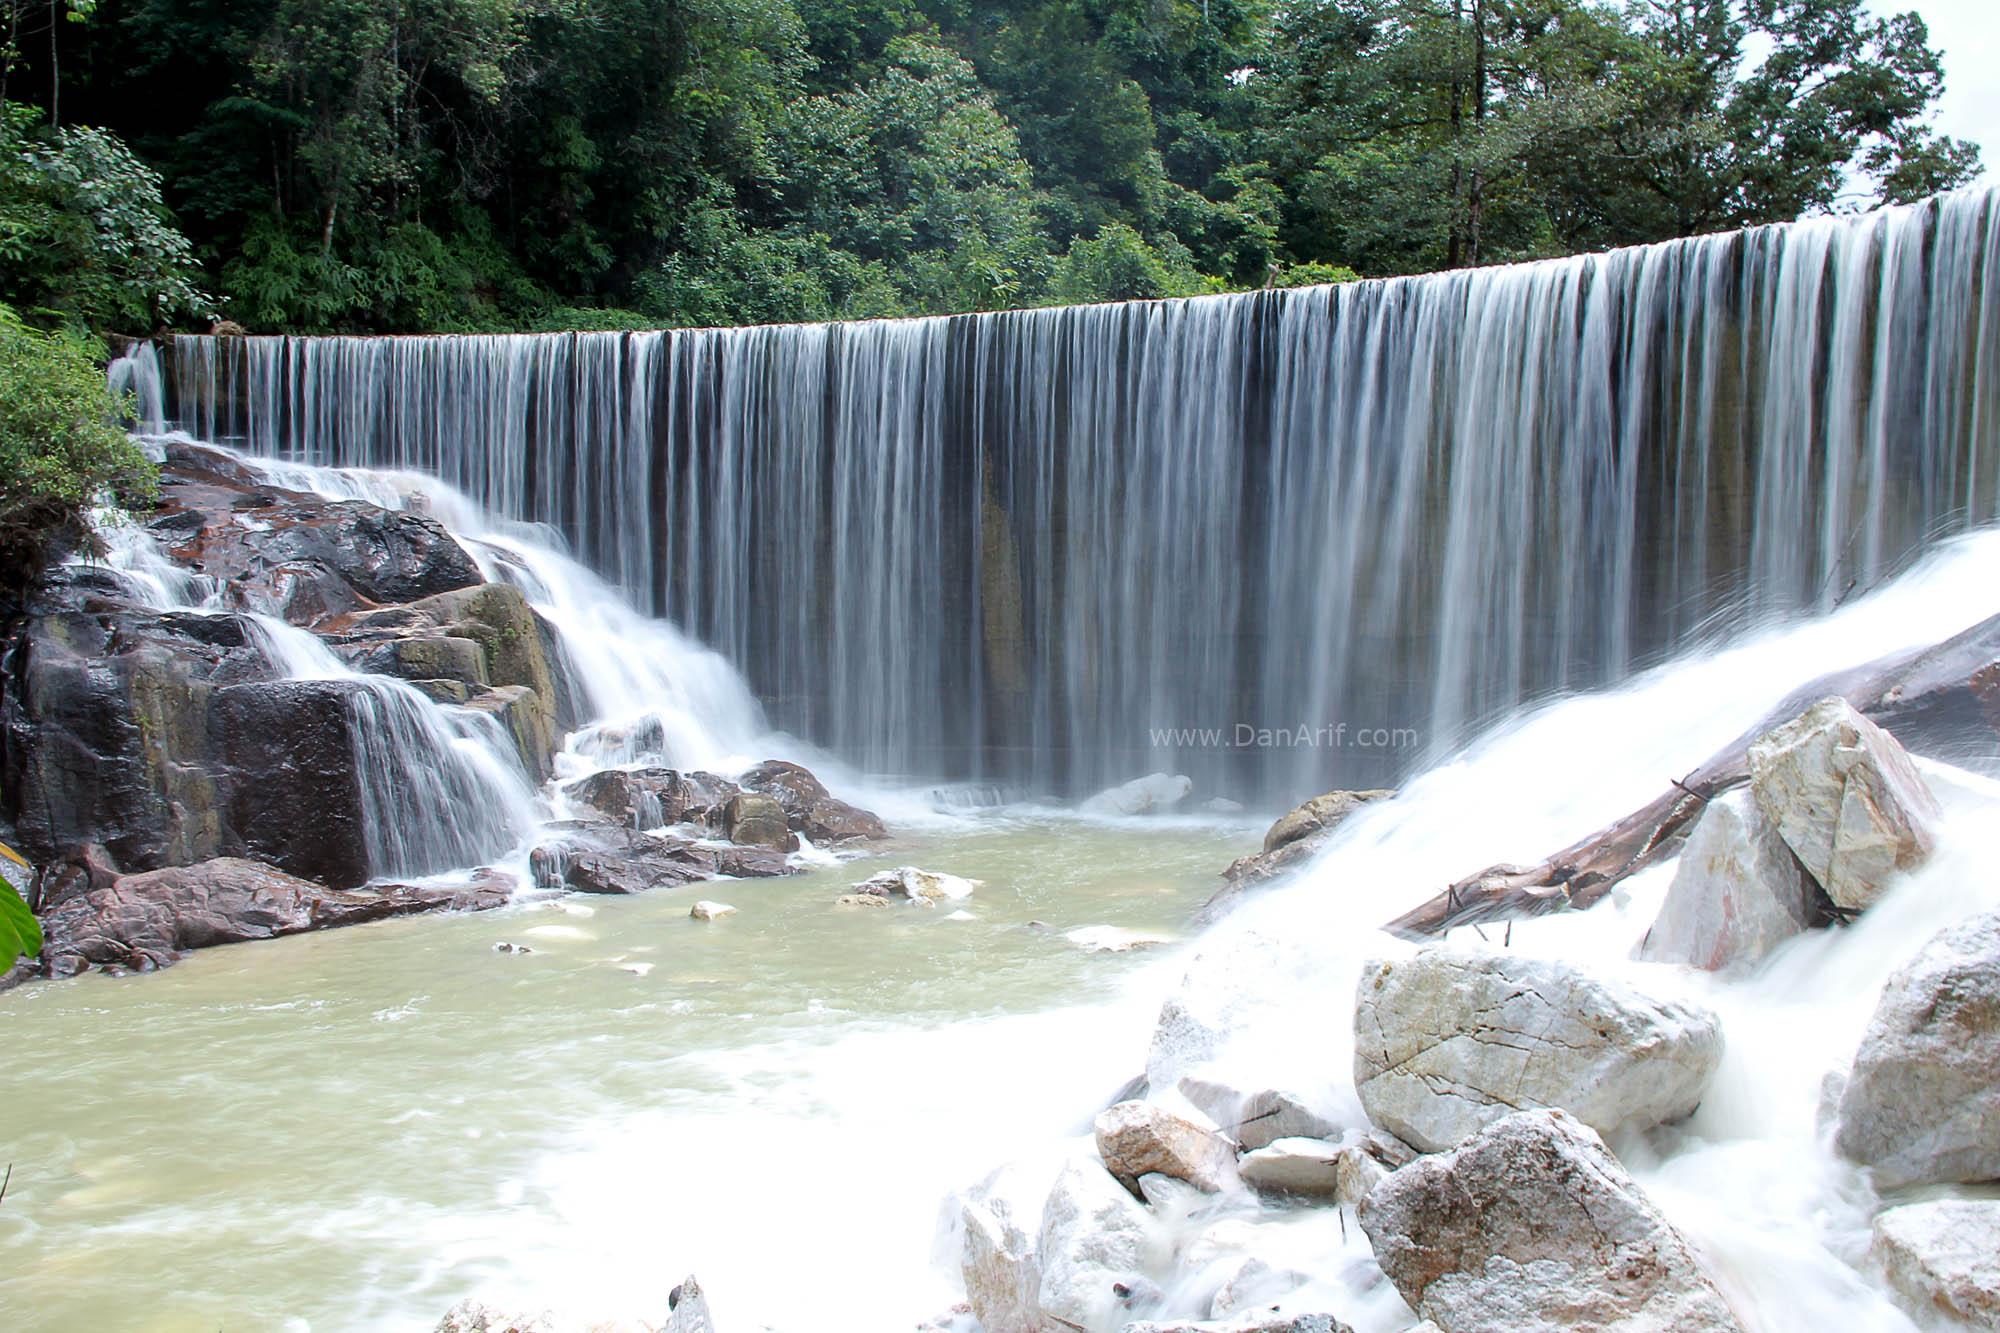 Waterfall Malaysia Perak Lubuk Timah Waterfall Perak